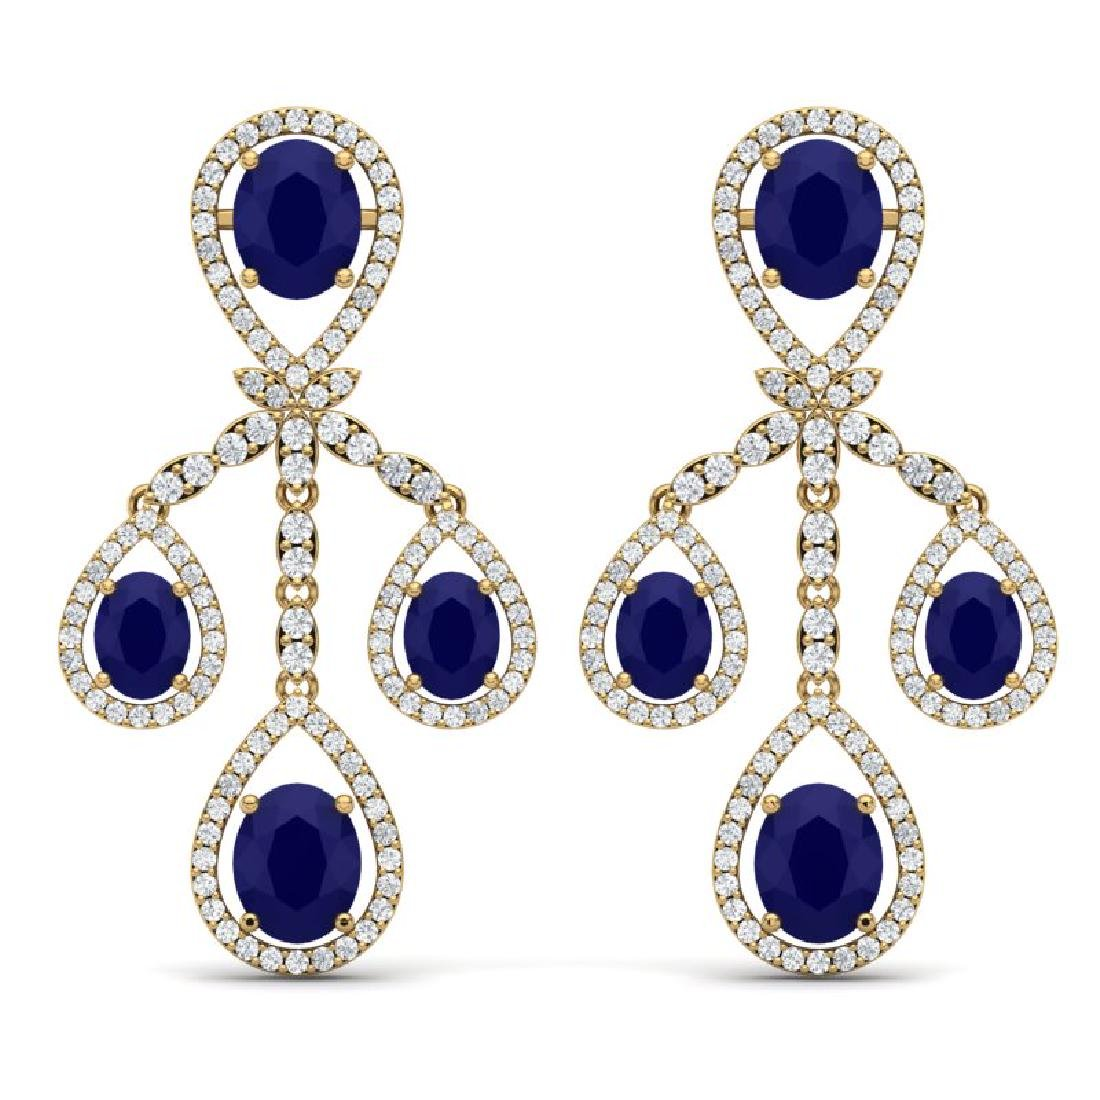 25.08 CTW Royalty Sapphire & VS Diamond Earrings 18K